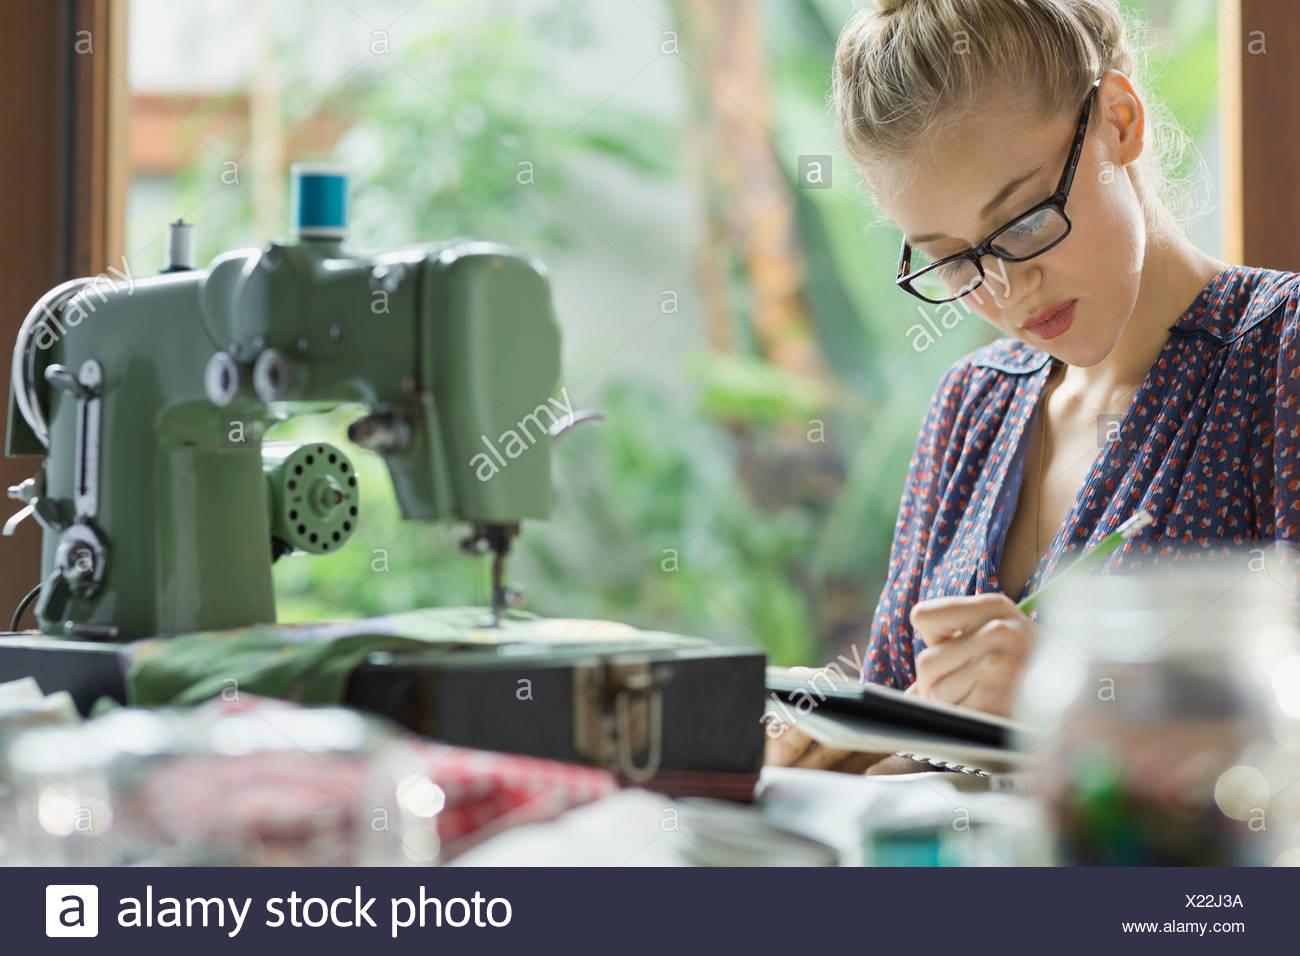 Fashion designer sketching ideas in sketchbook - Stock Image